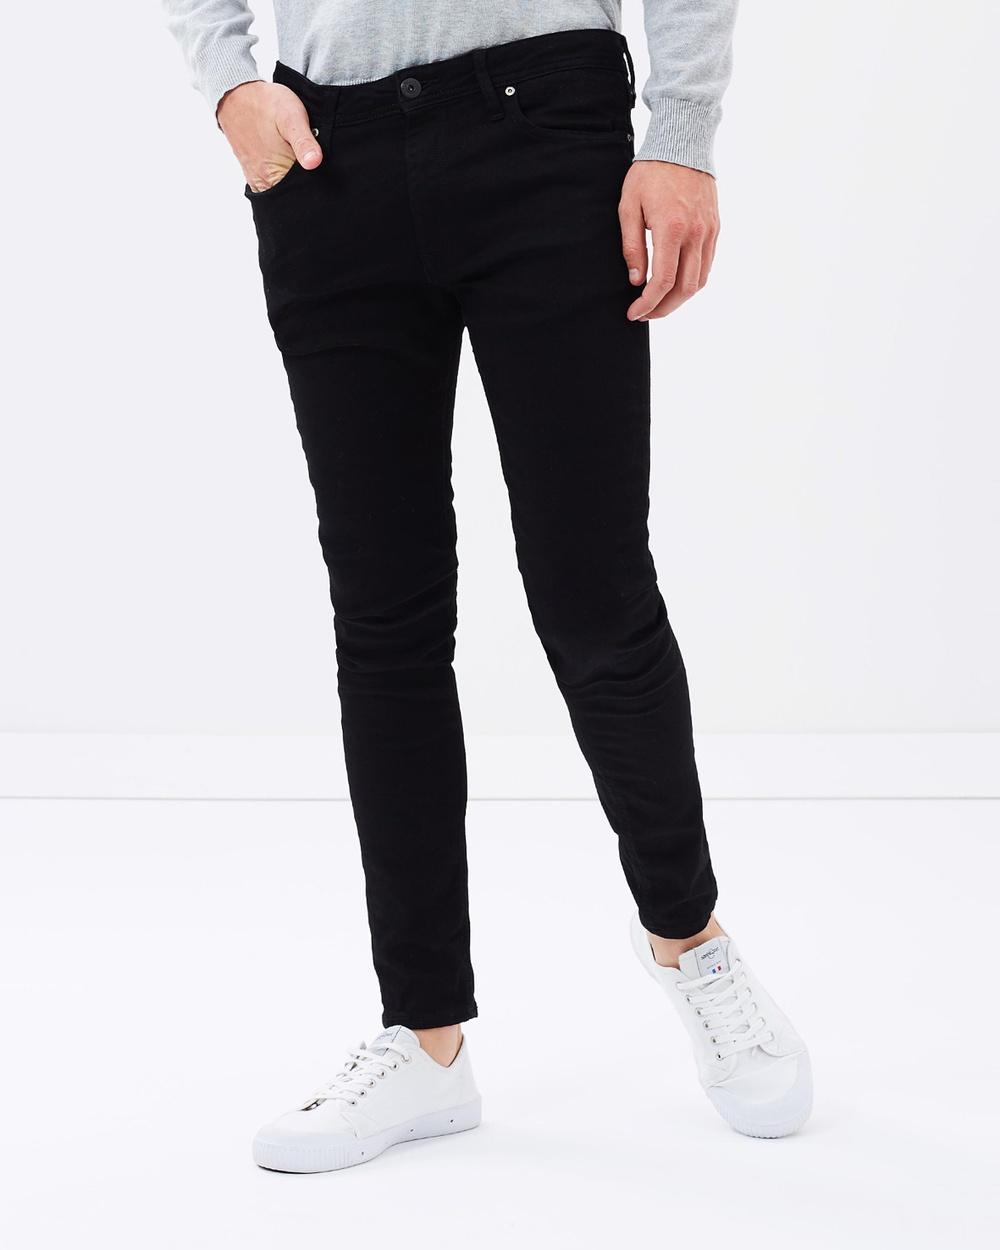 Jack & Jones Liam Jeans Skinny Fit Black